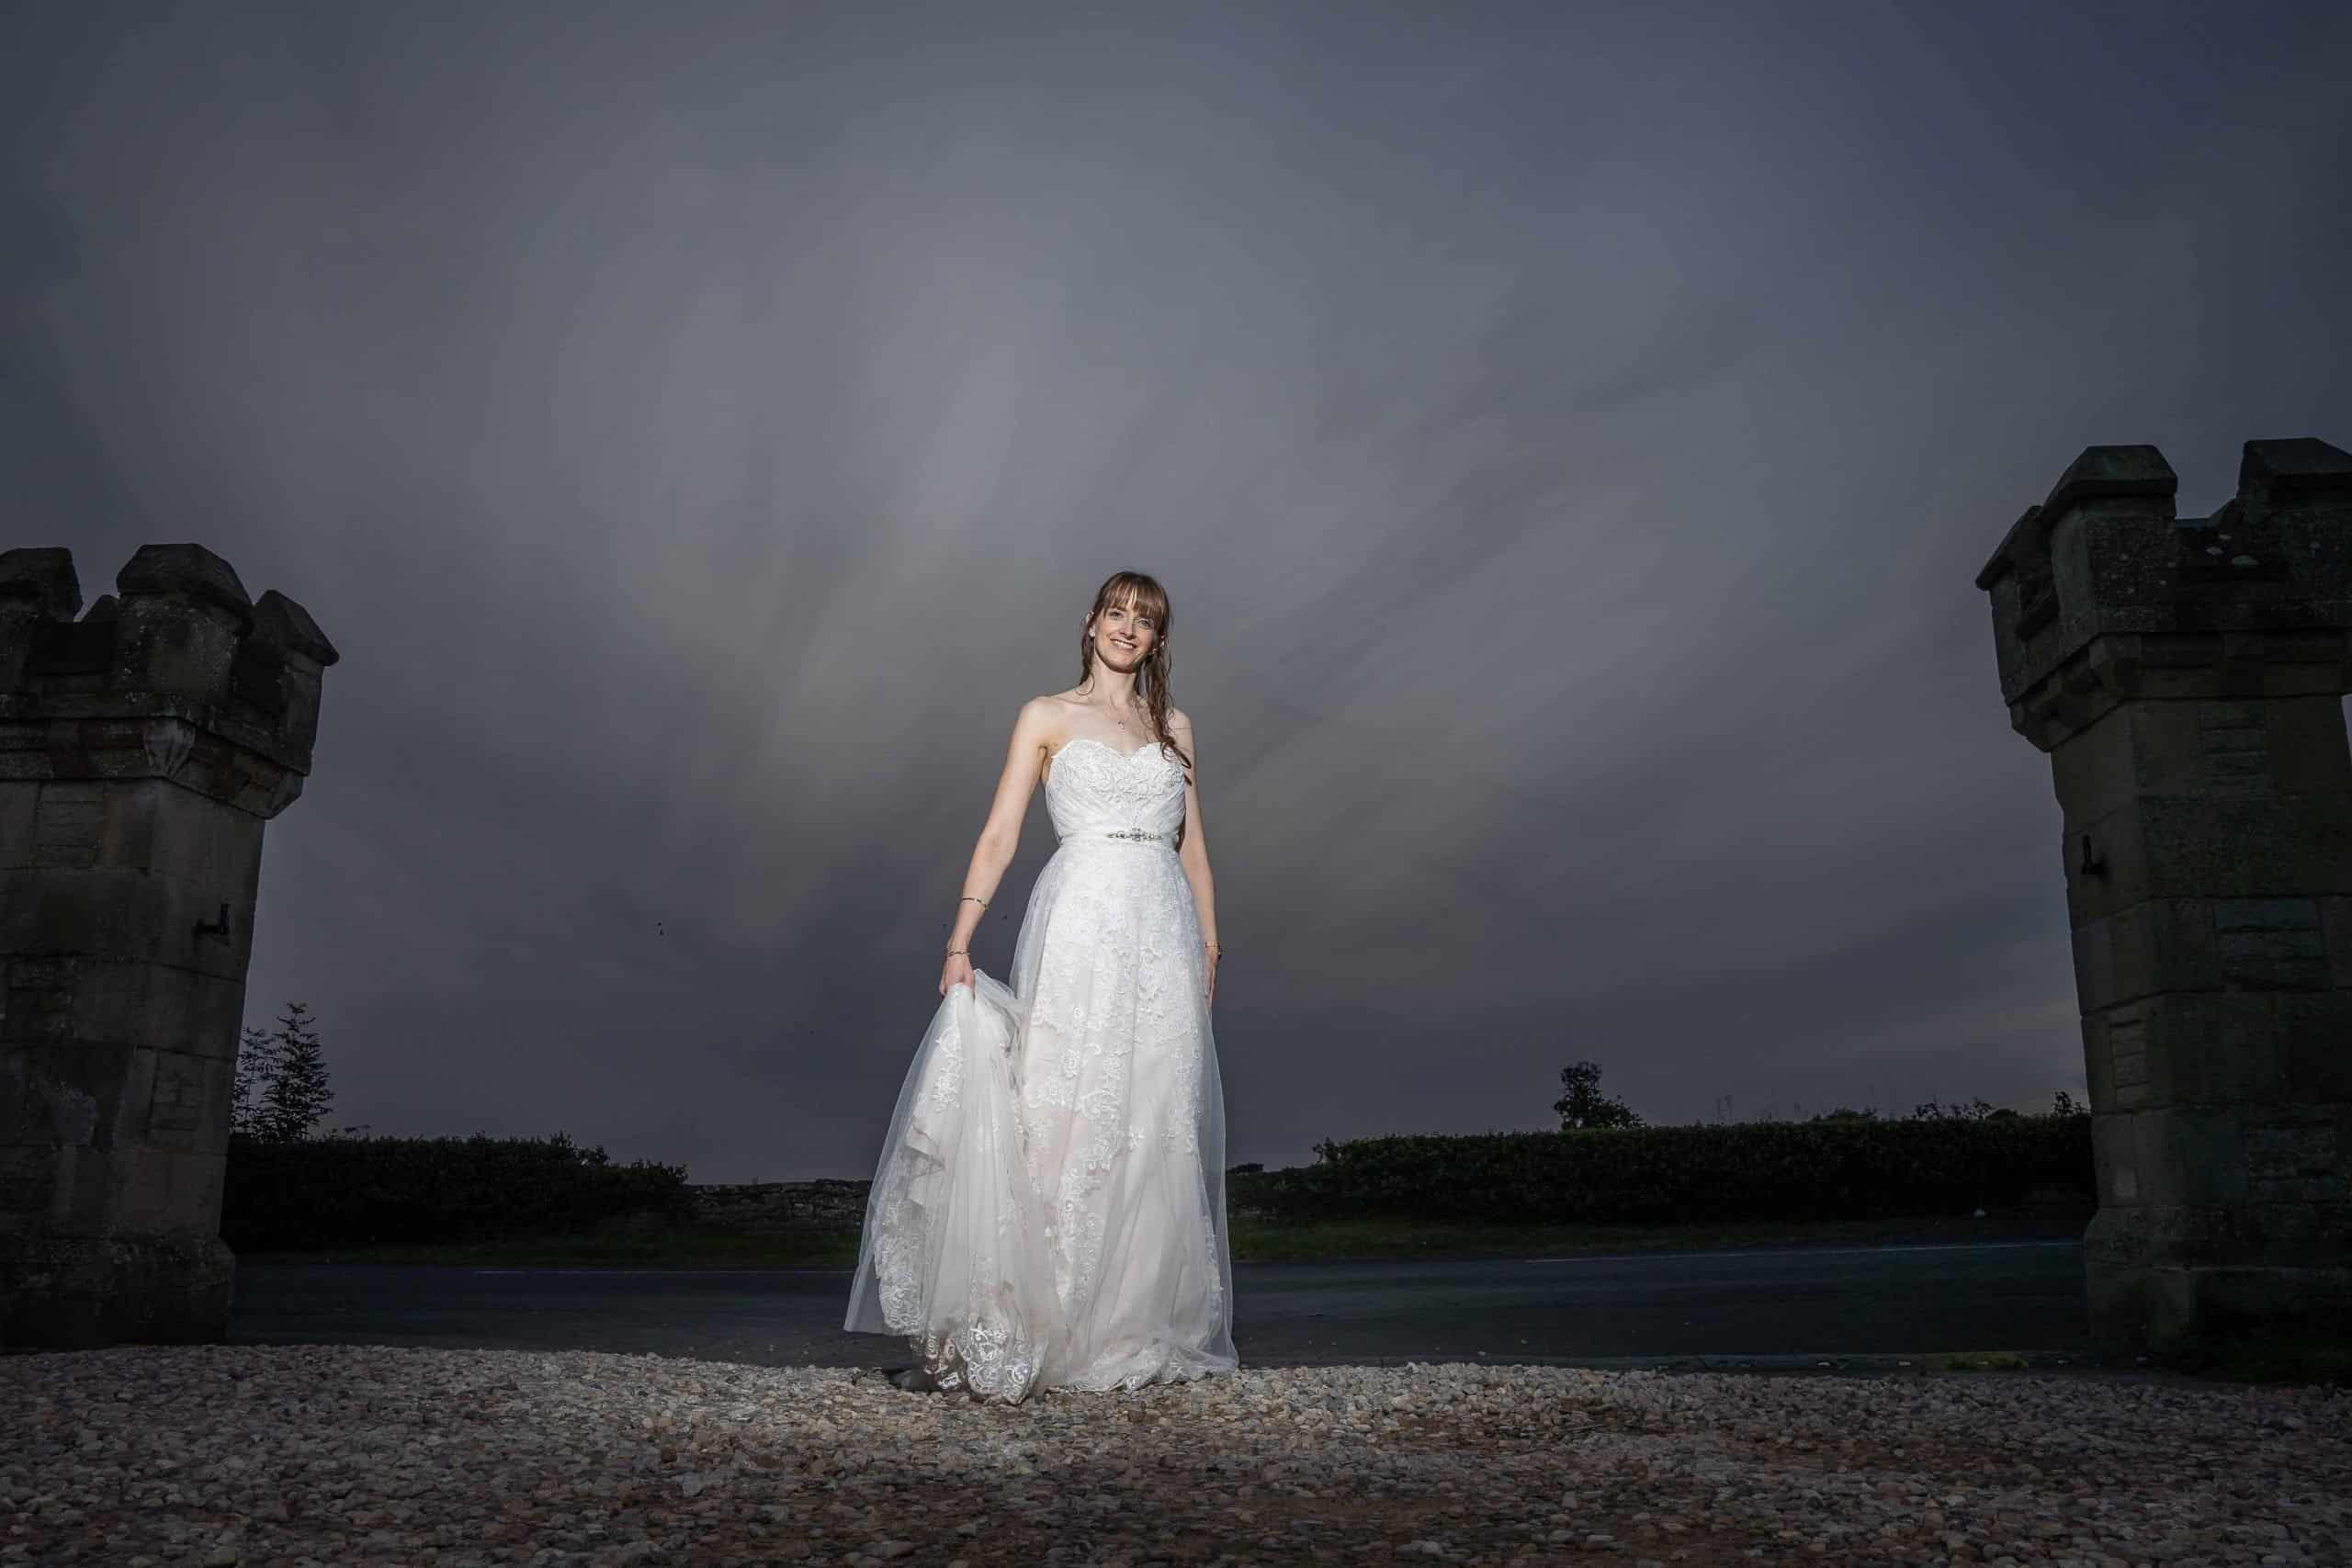 Creative bridal photos at Walworth Castle